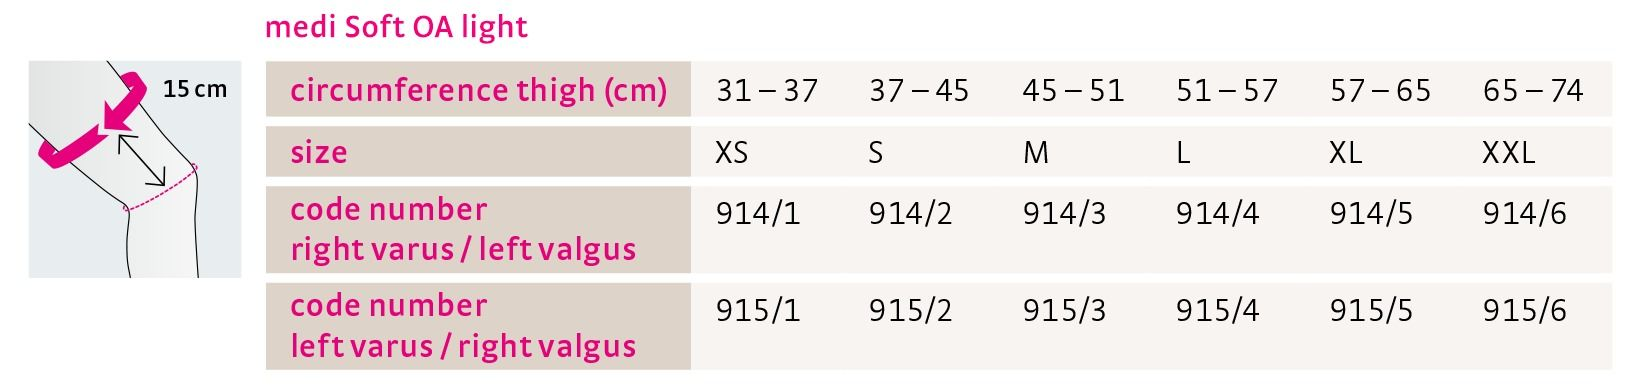 Size chart medi Soft OA light english